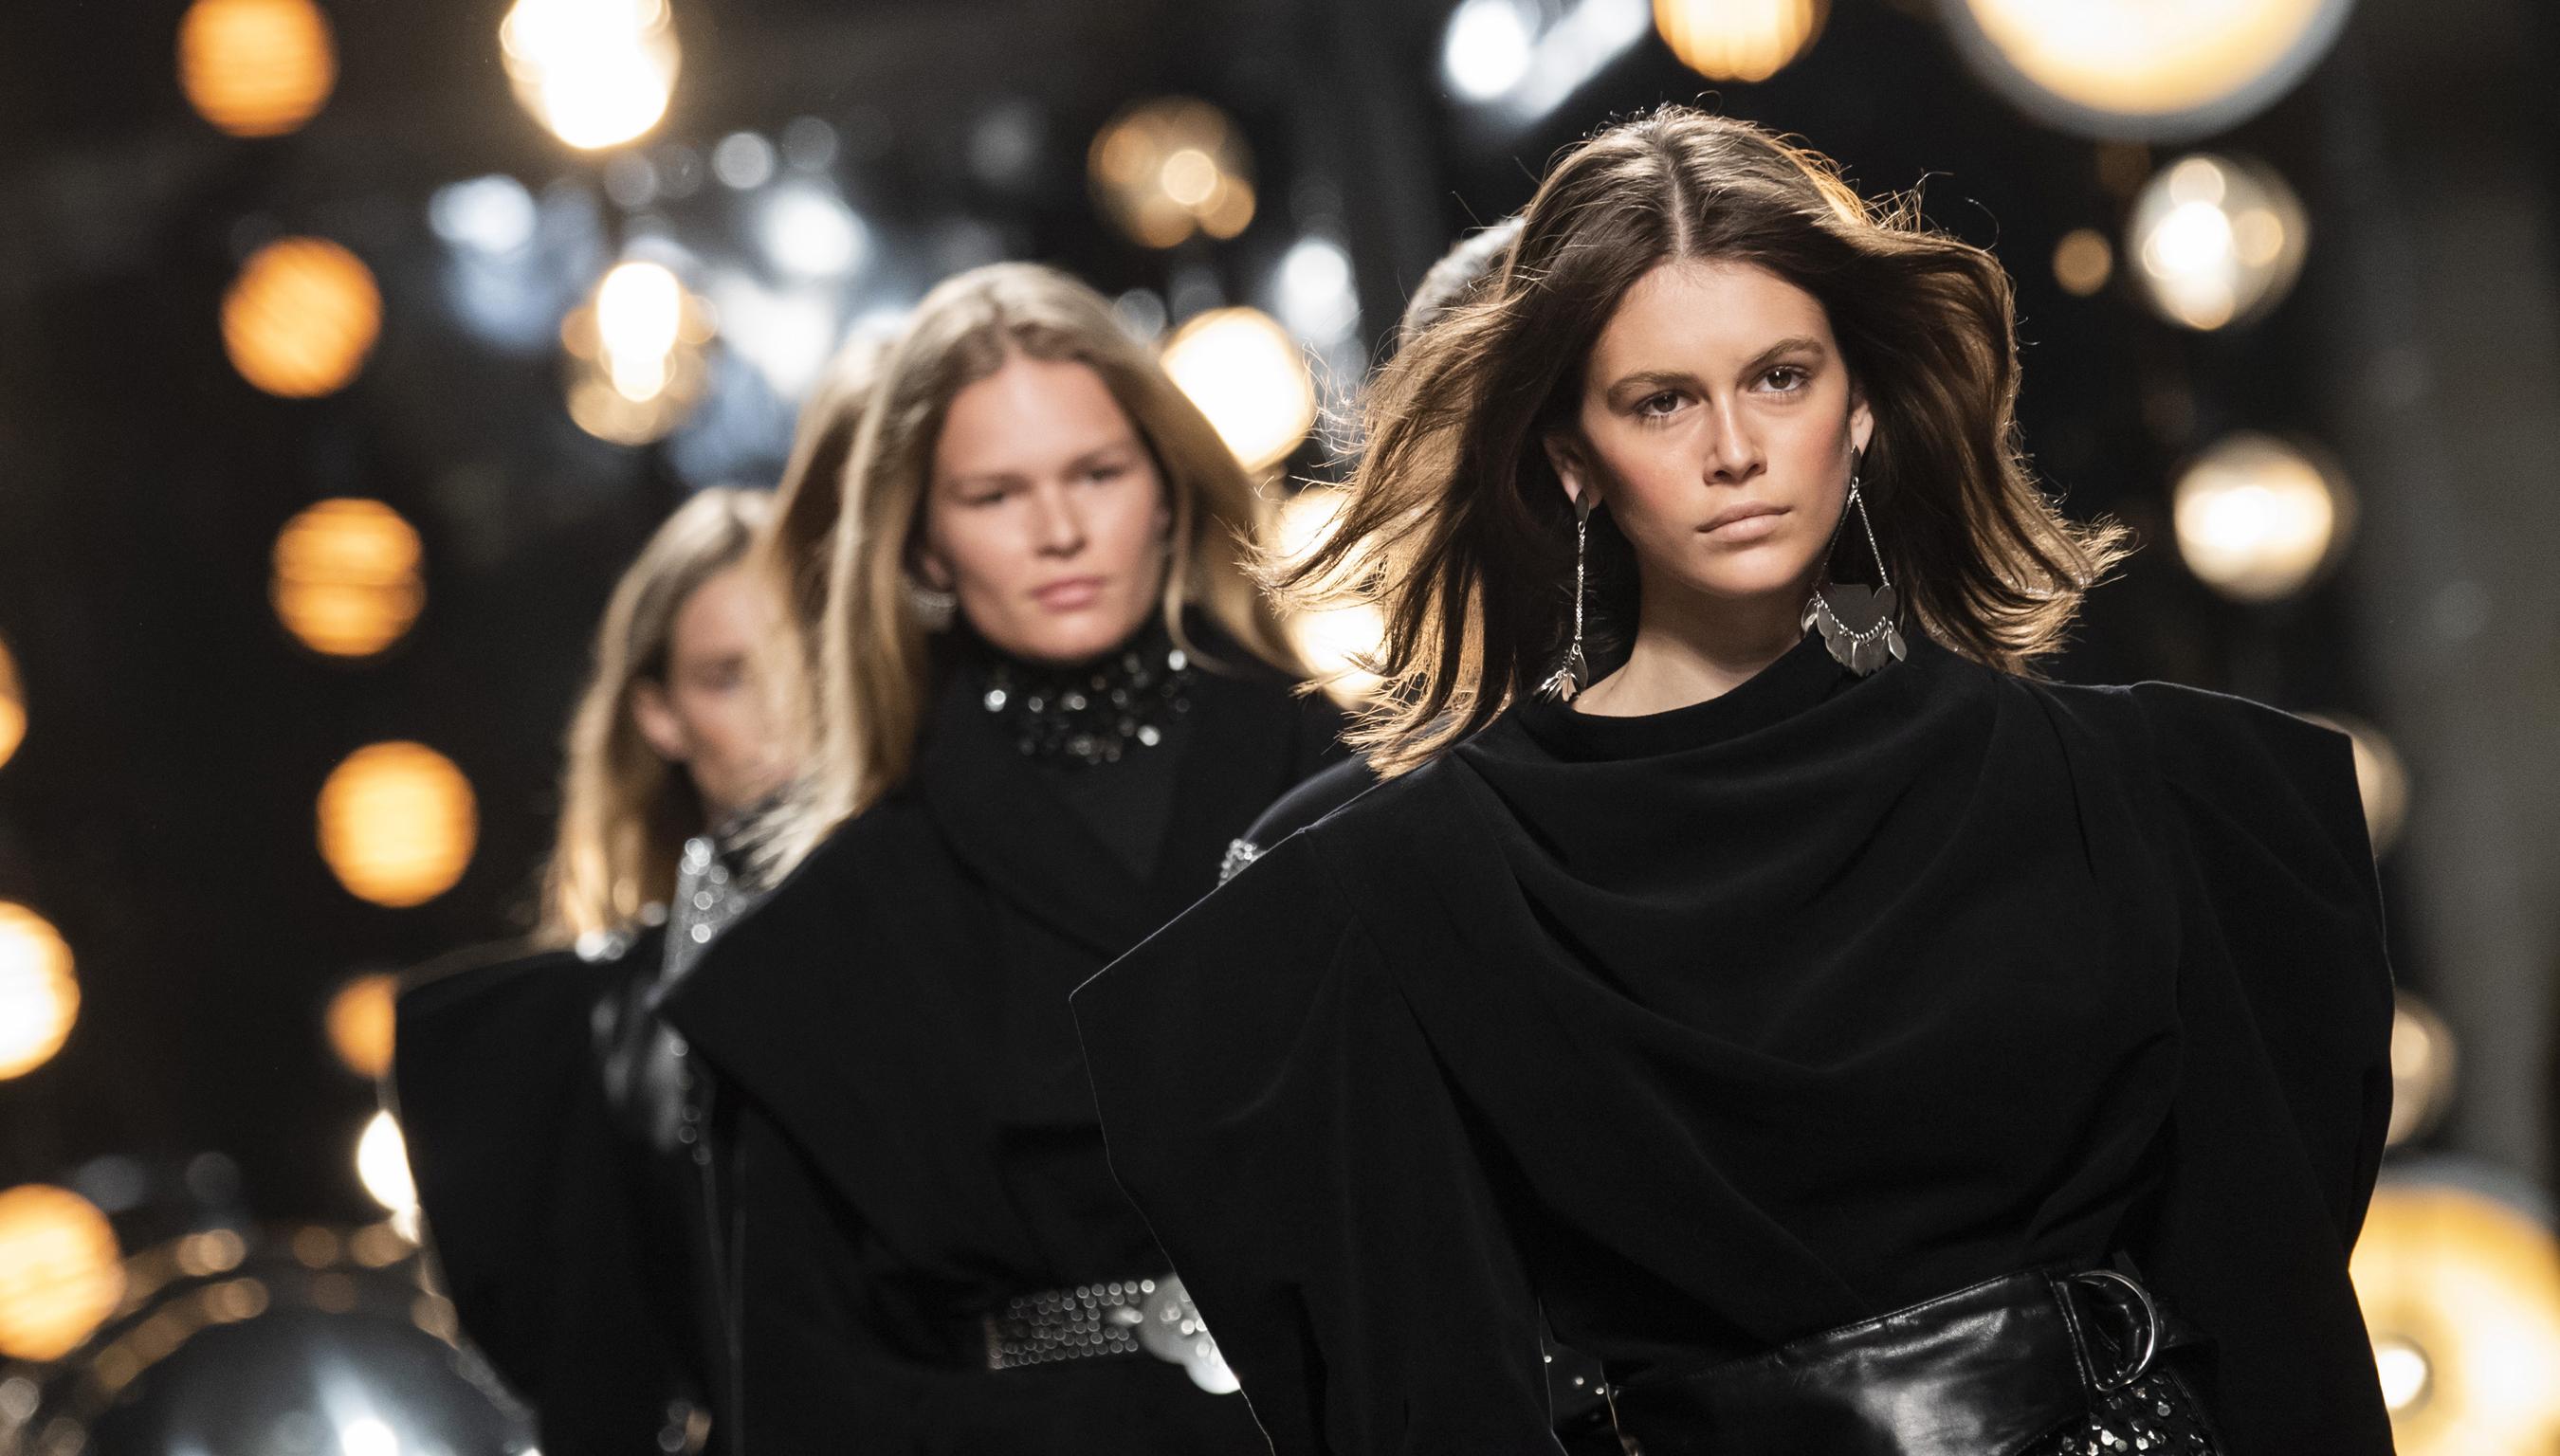 Isabel Marant Fashion Designer Interview